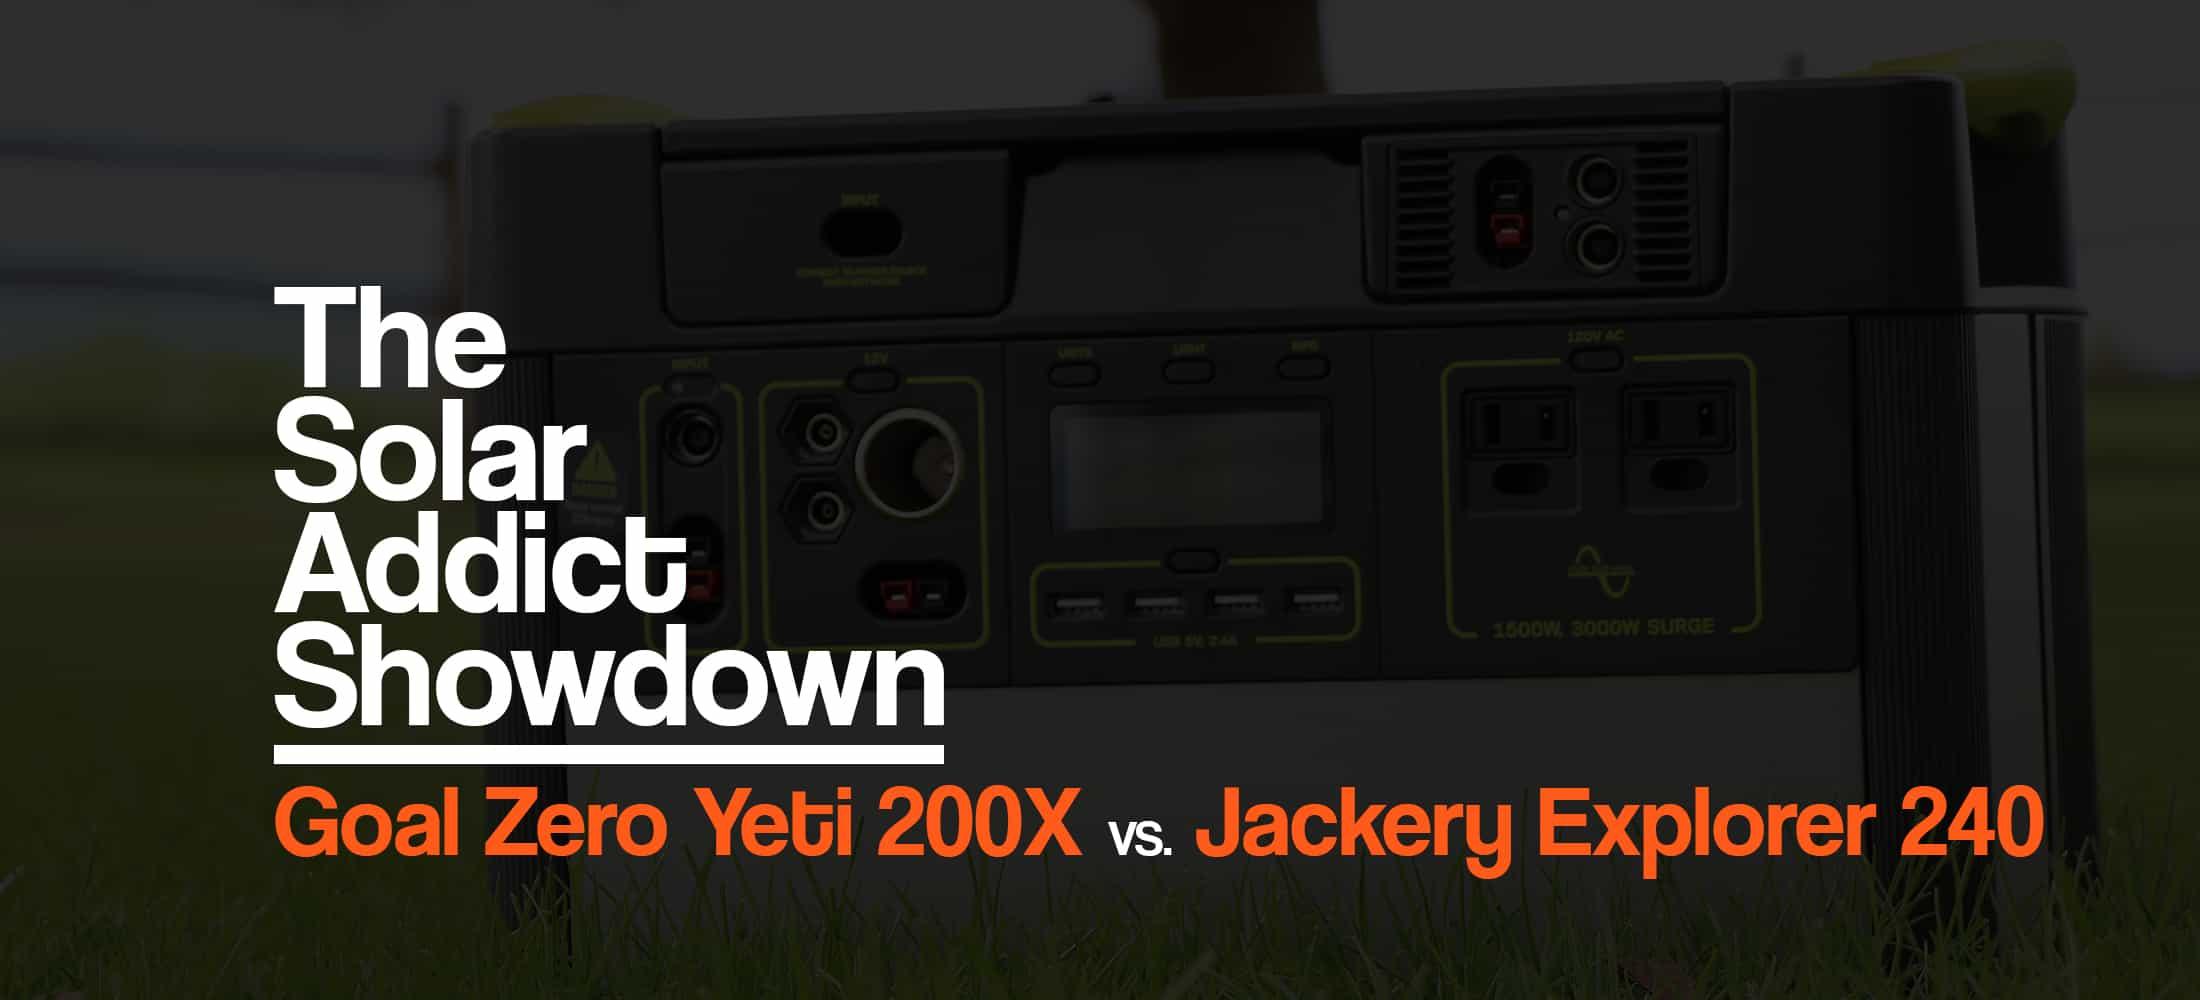 goal-zero-yeti-200x-vs-jackery-explorer-240-solar-generator-power-station-the-solar-addict-2